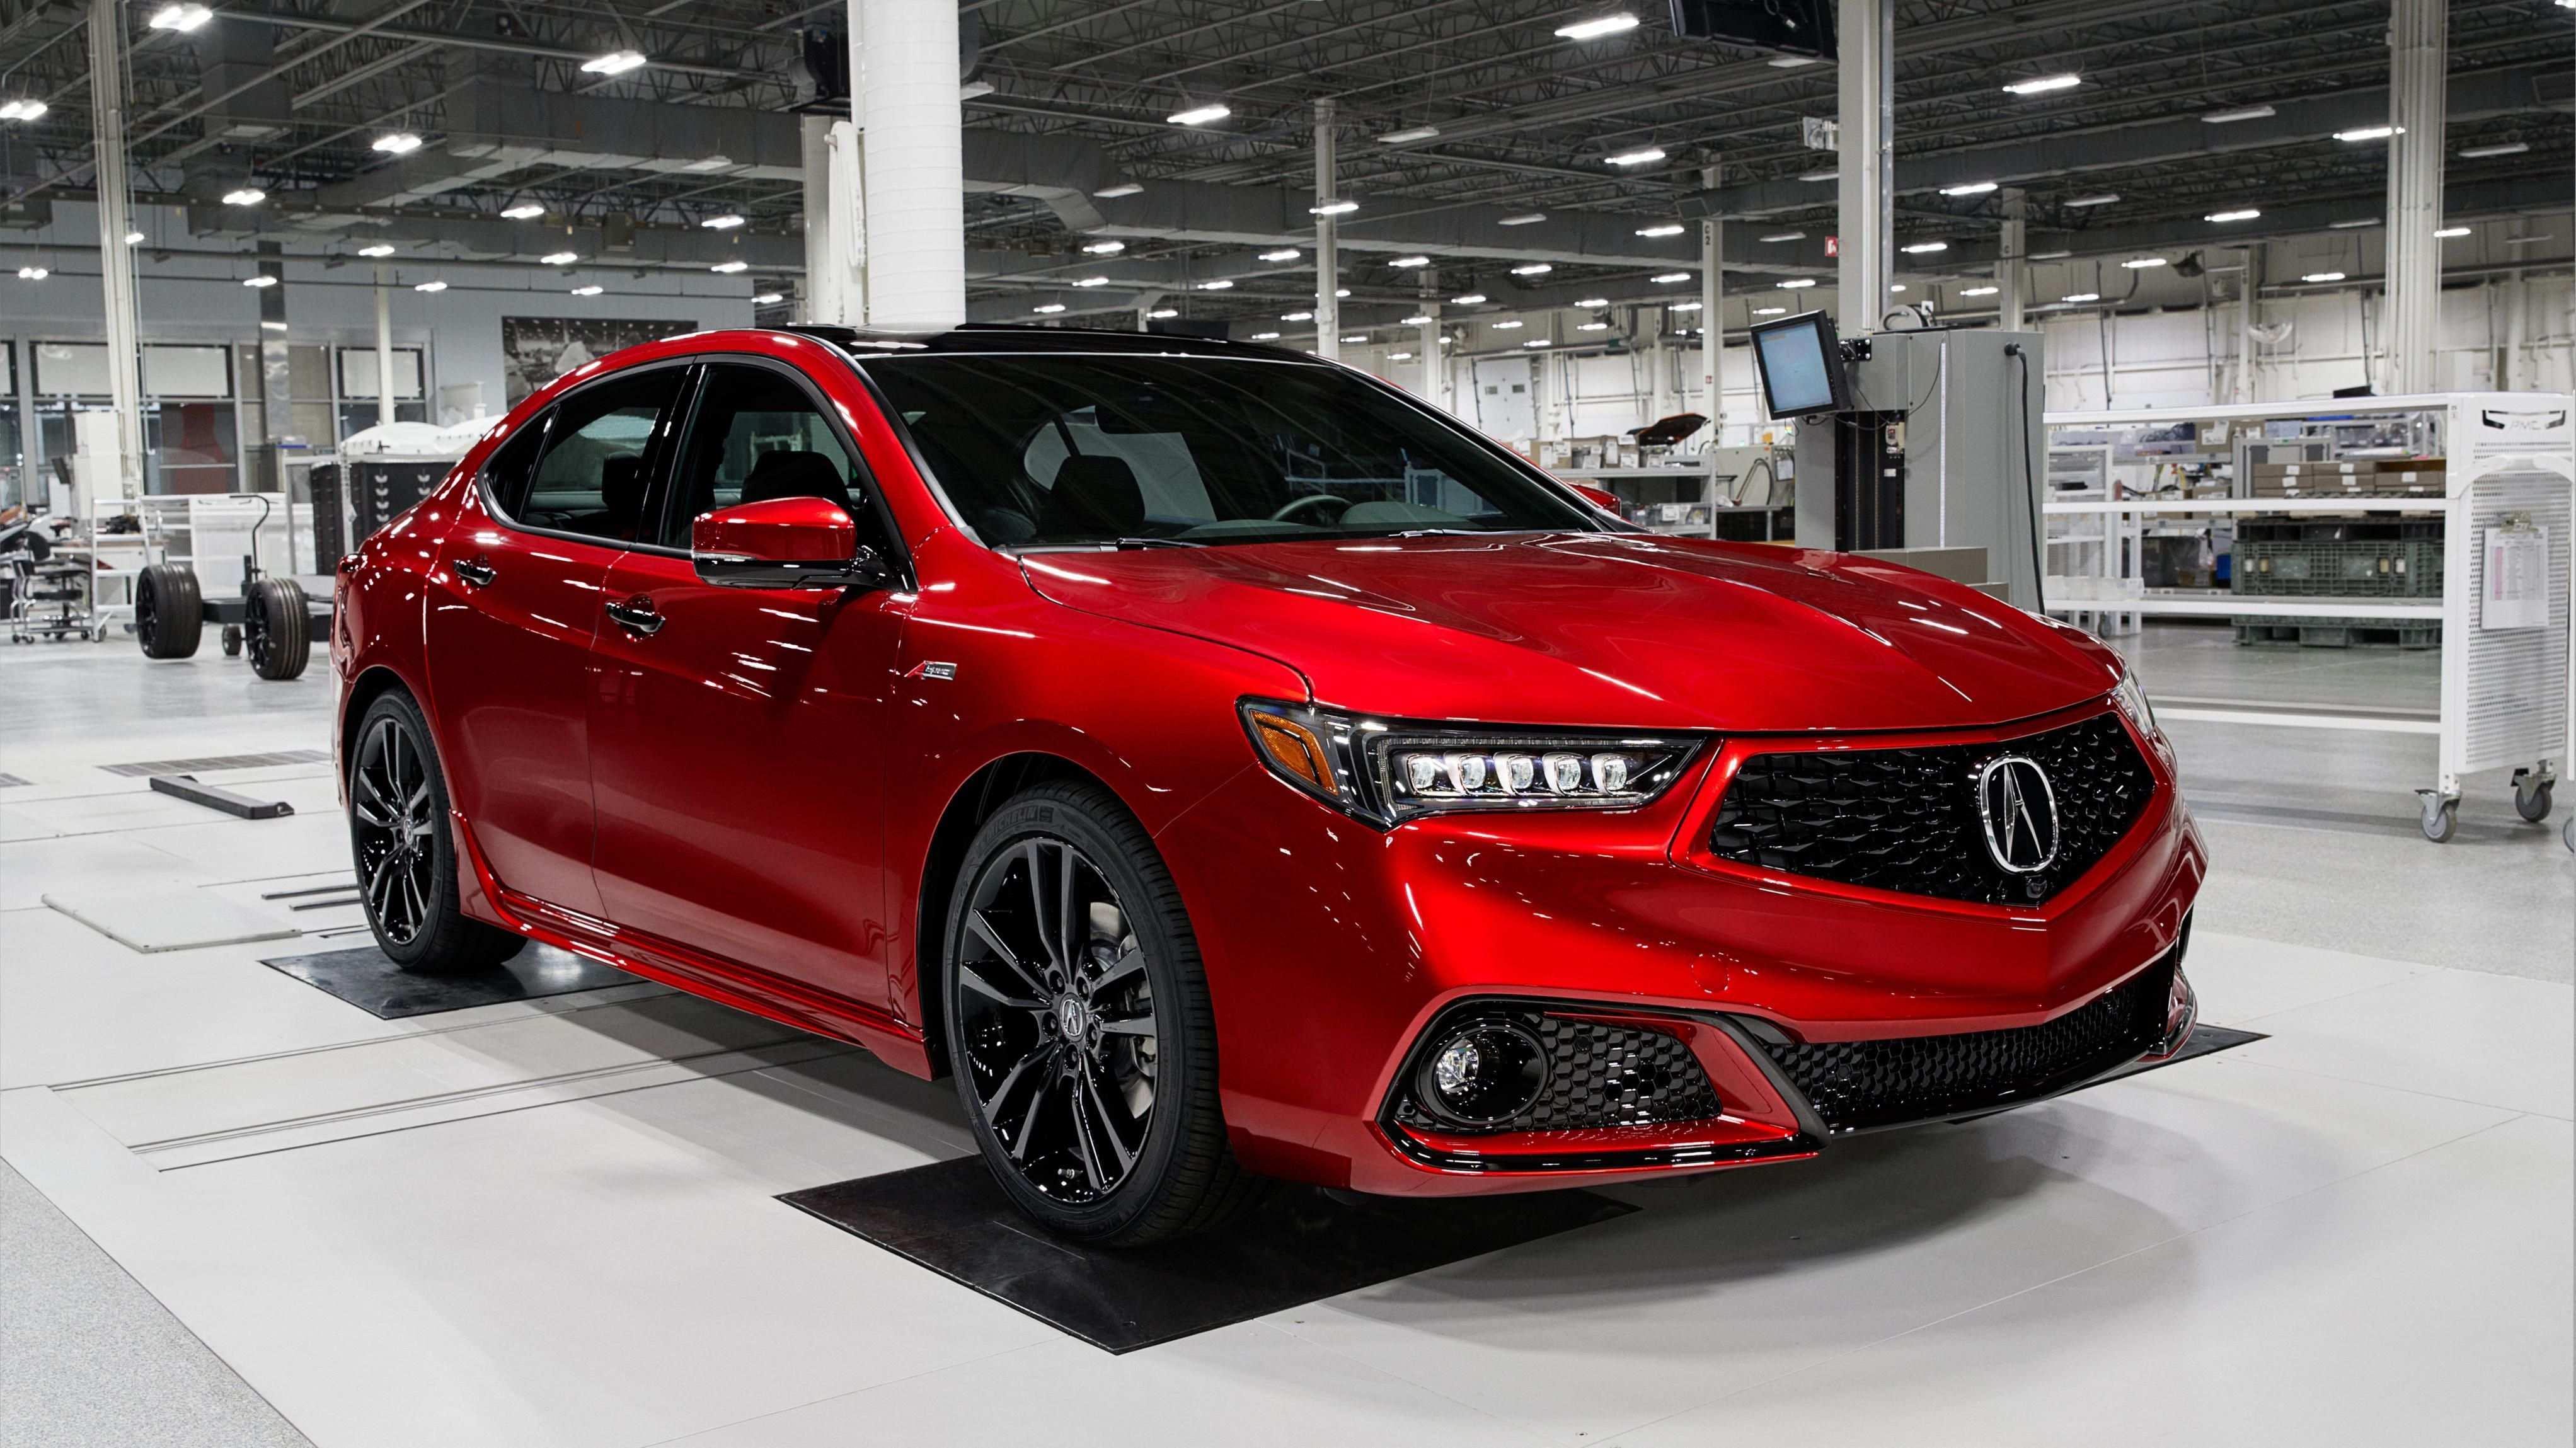 96 All New Acura Sedan 2020 Release for Acura Sedan 2020